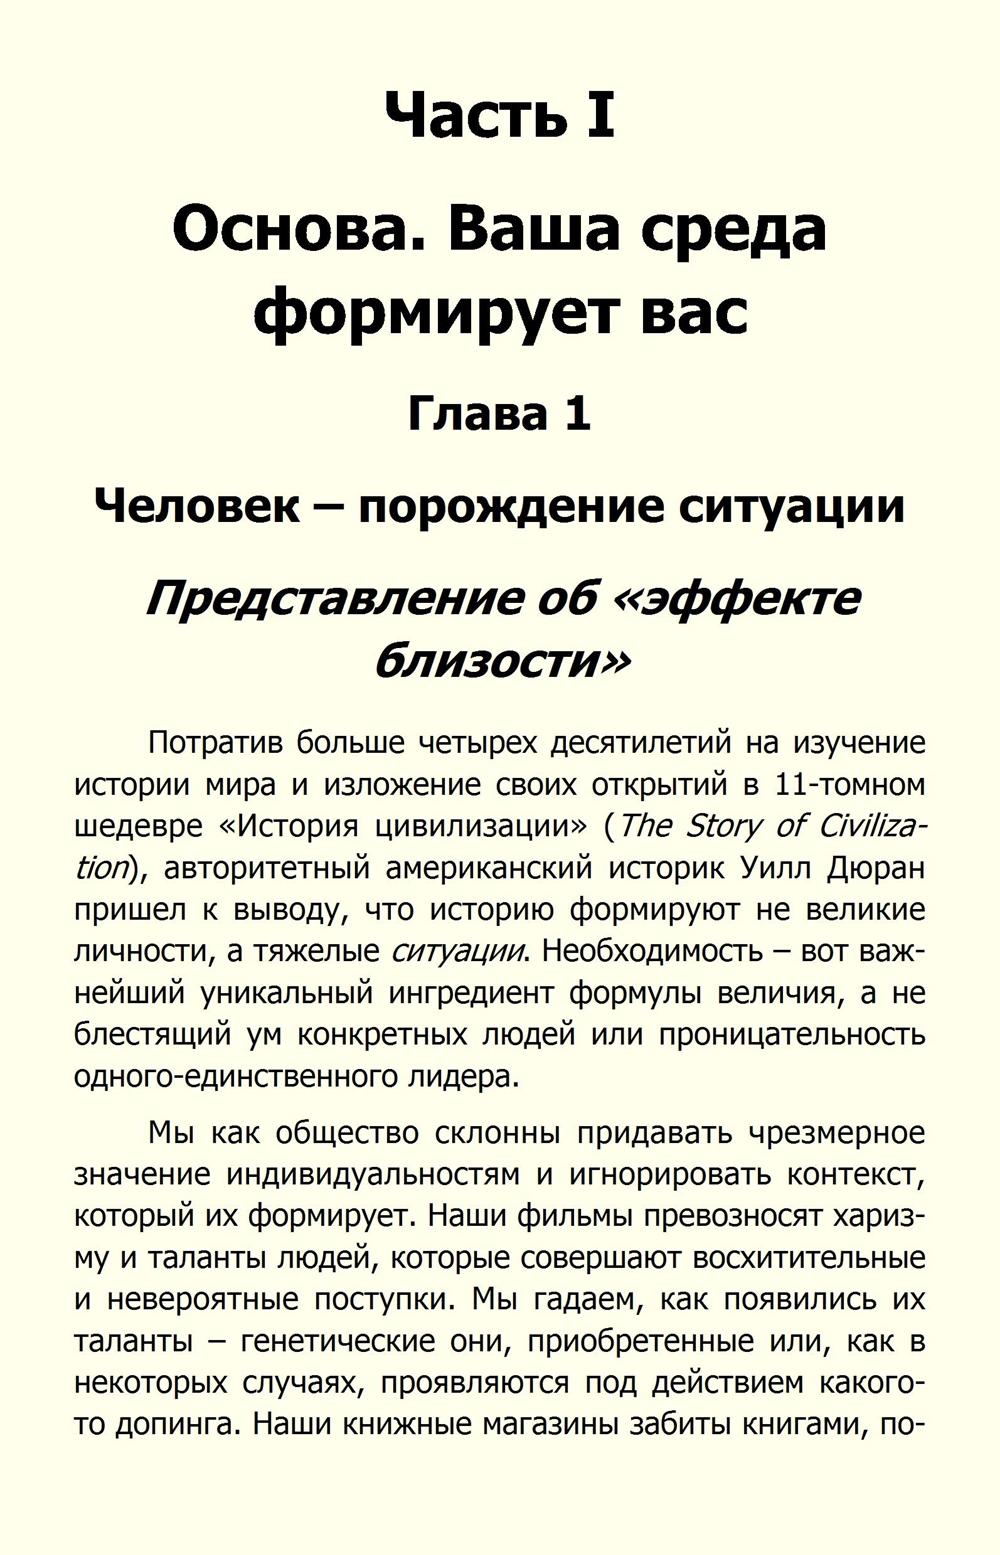 http://ipic.su/img/img7/fs/Silavolinerabotaet_023.1579720182.jpg